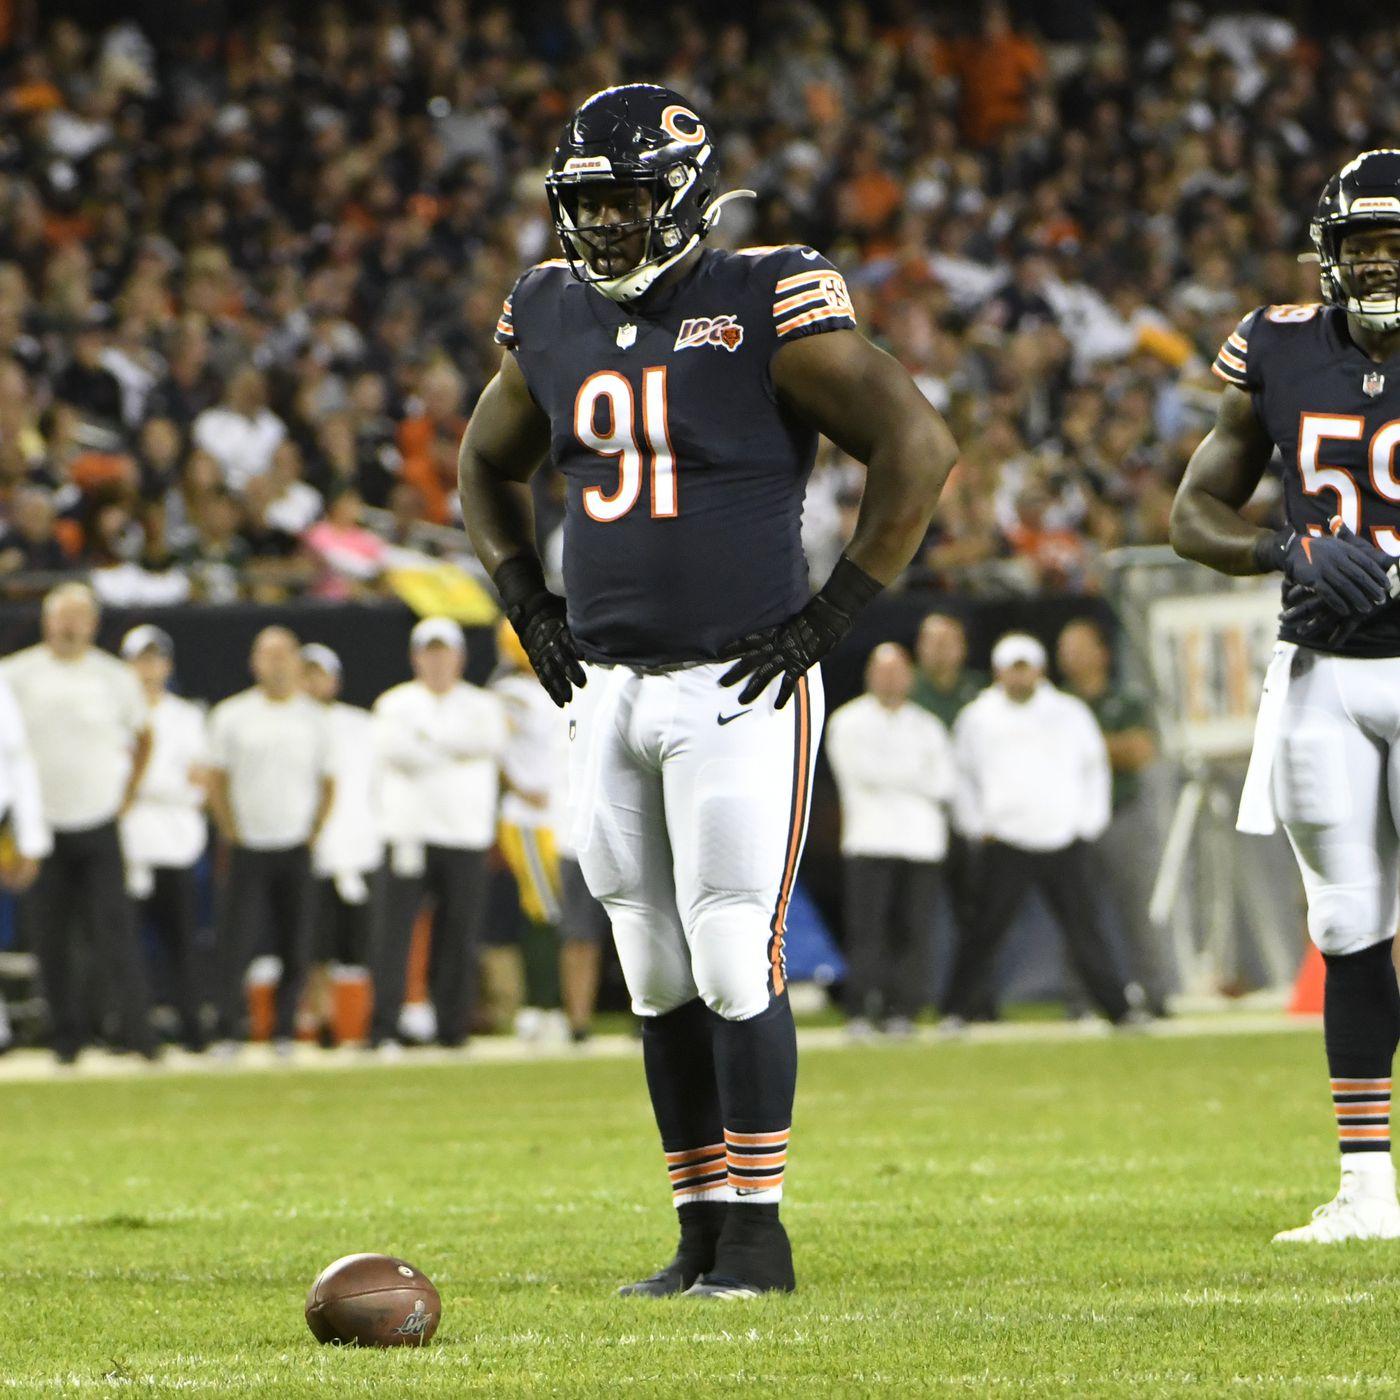 Unsung star: Bears' Eddie Goldman 'one of the best' - Chicago Sun ...